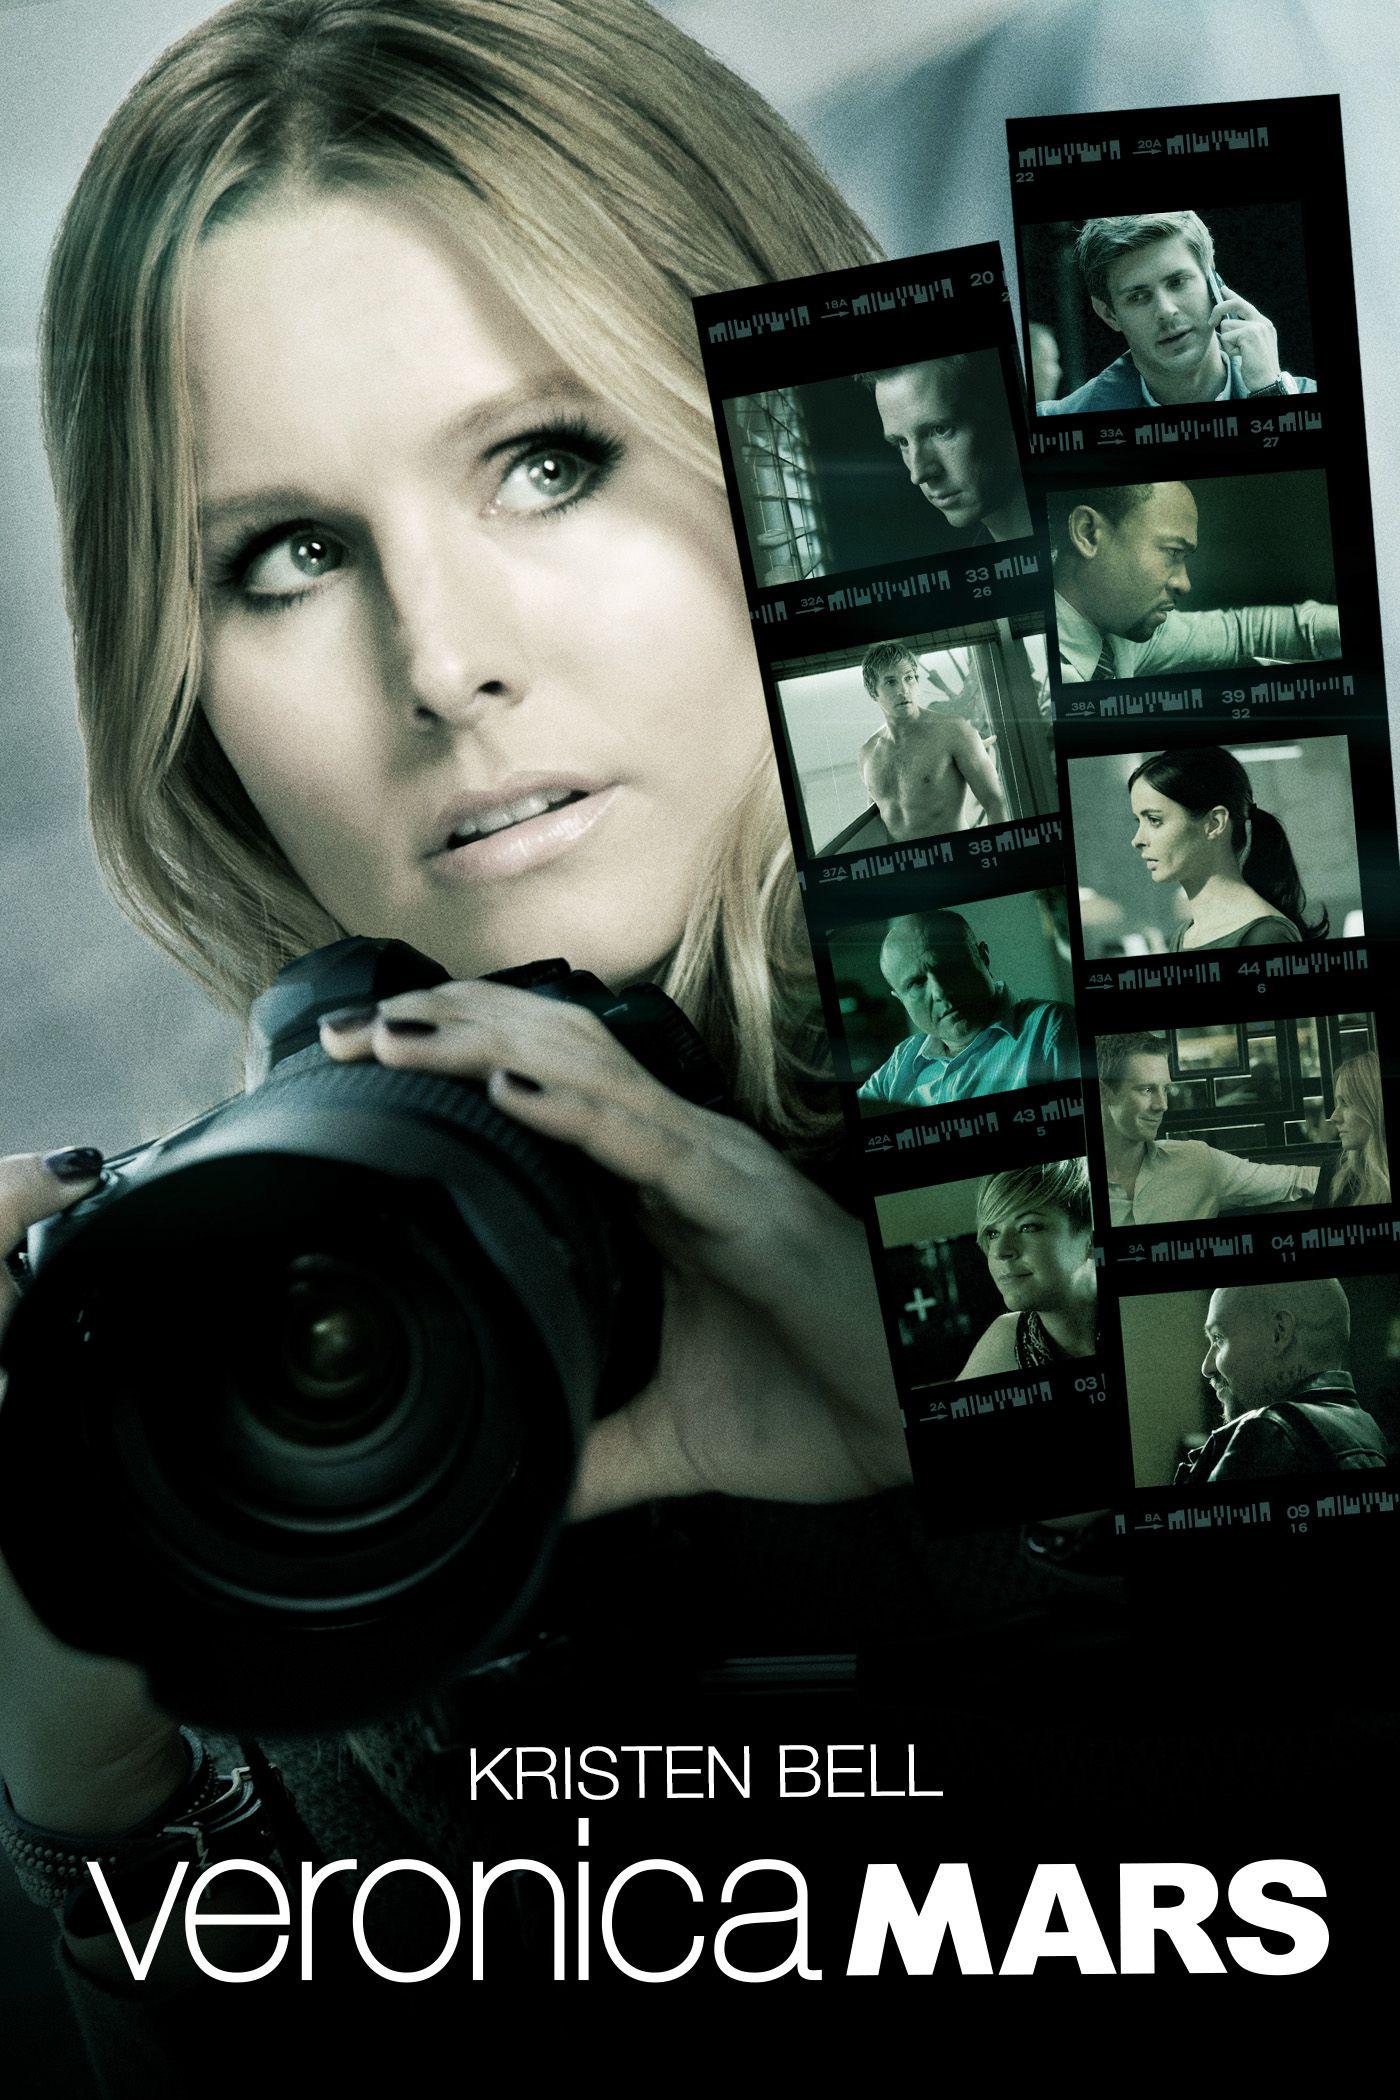 Veronica Mars Saison 1 Telecharger Utorrent : veronica, saison, telecharger, utorrent, Veronica, (2014), Torrent, Cpasbien